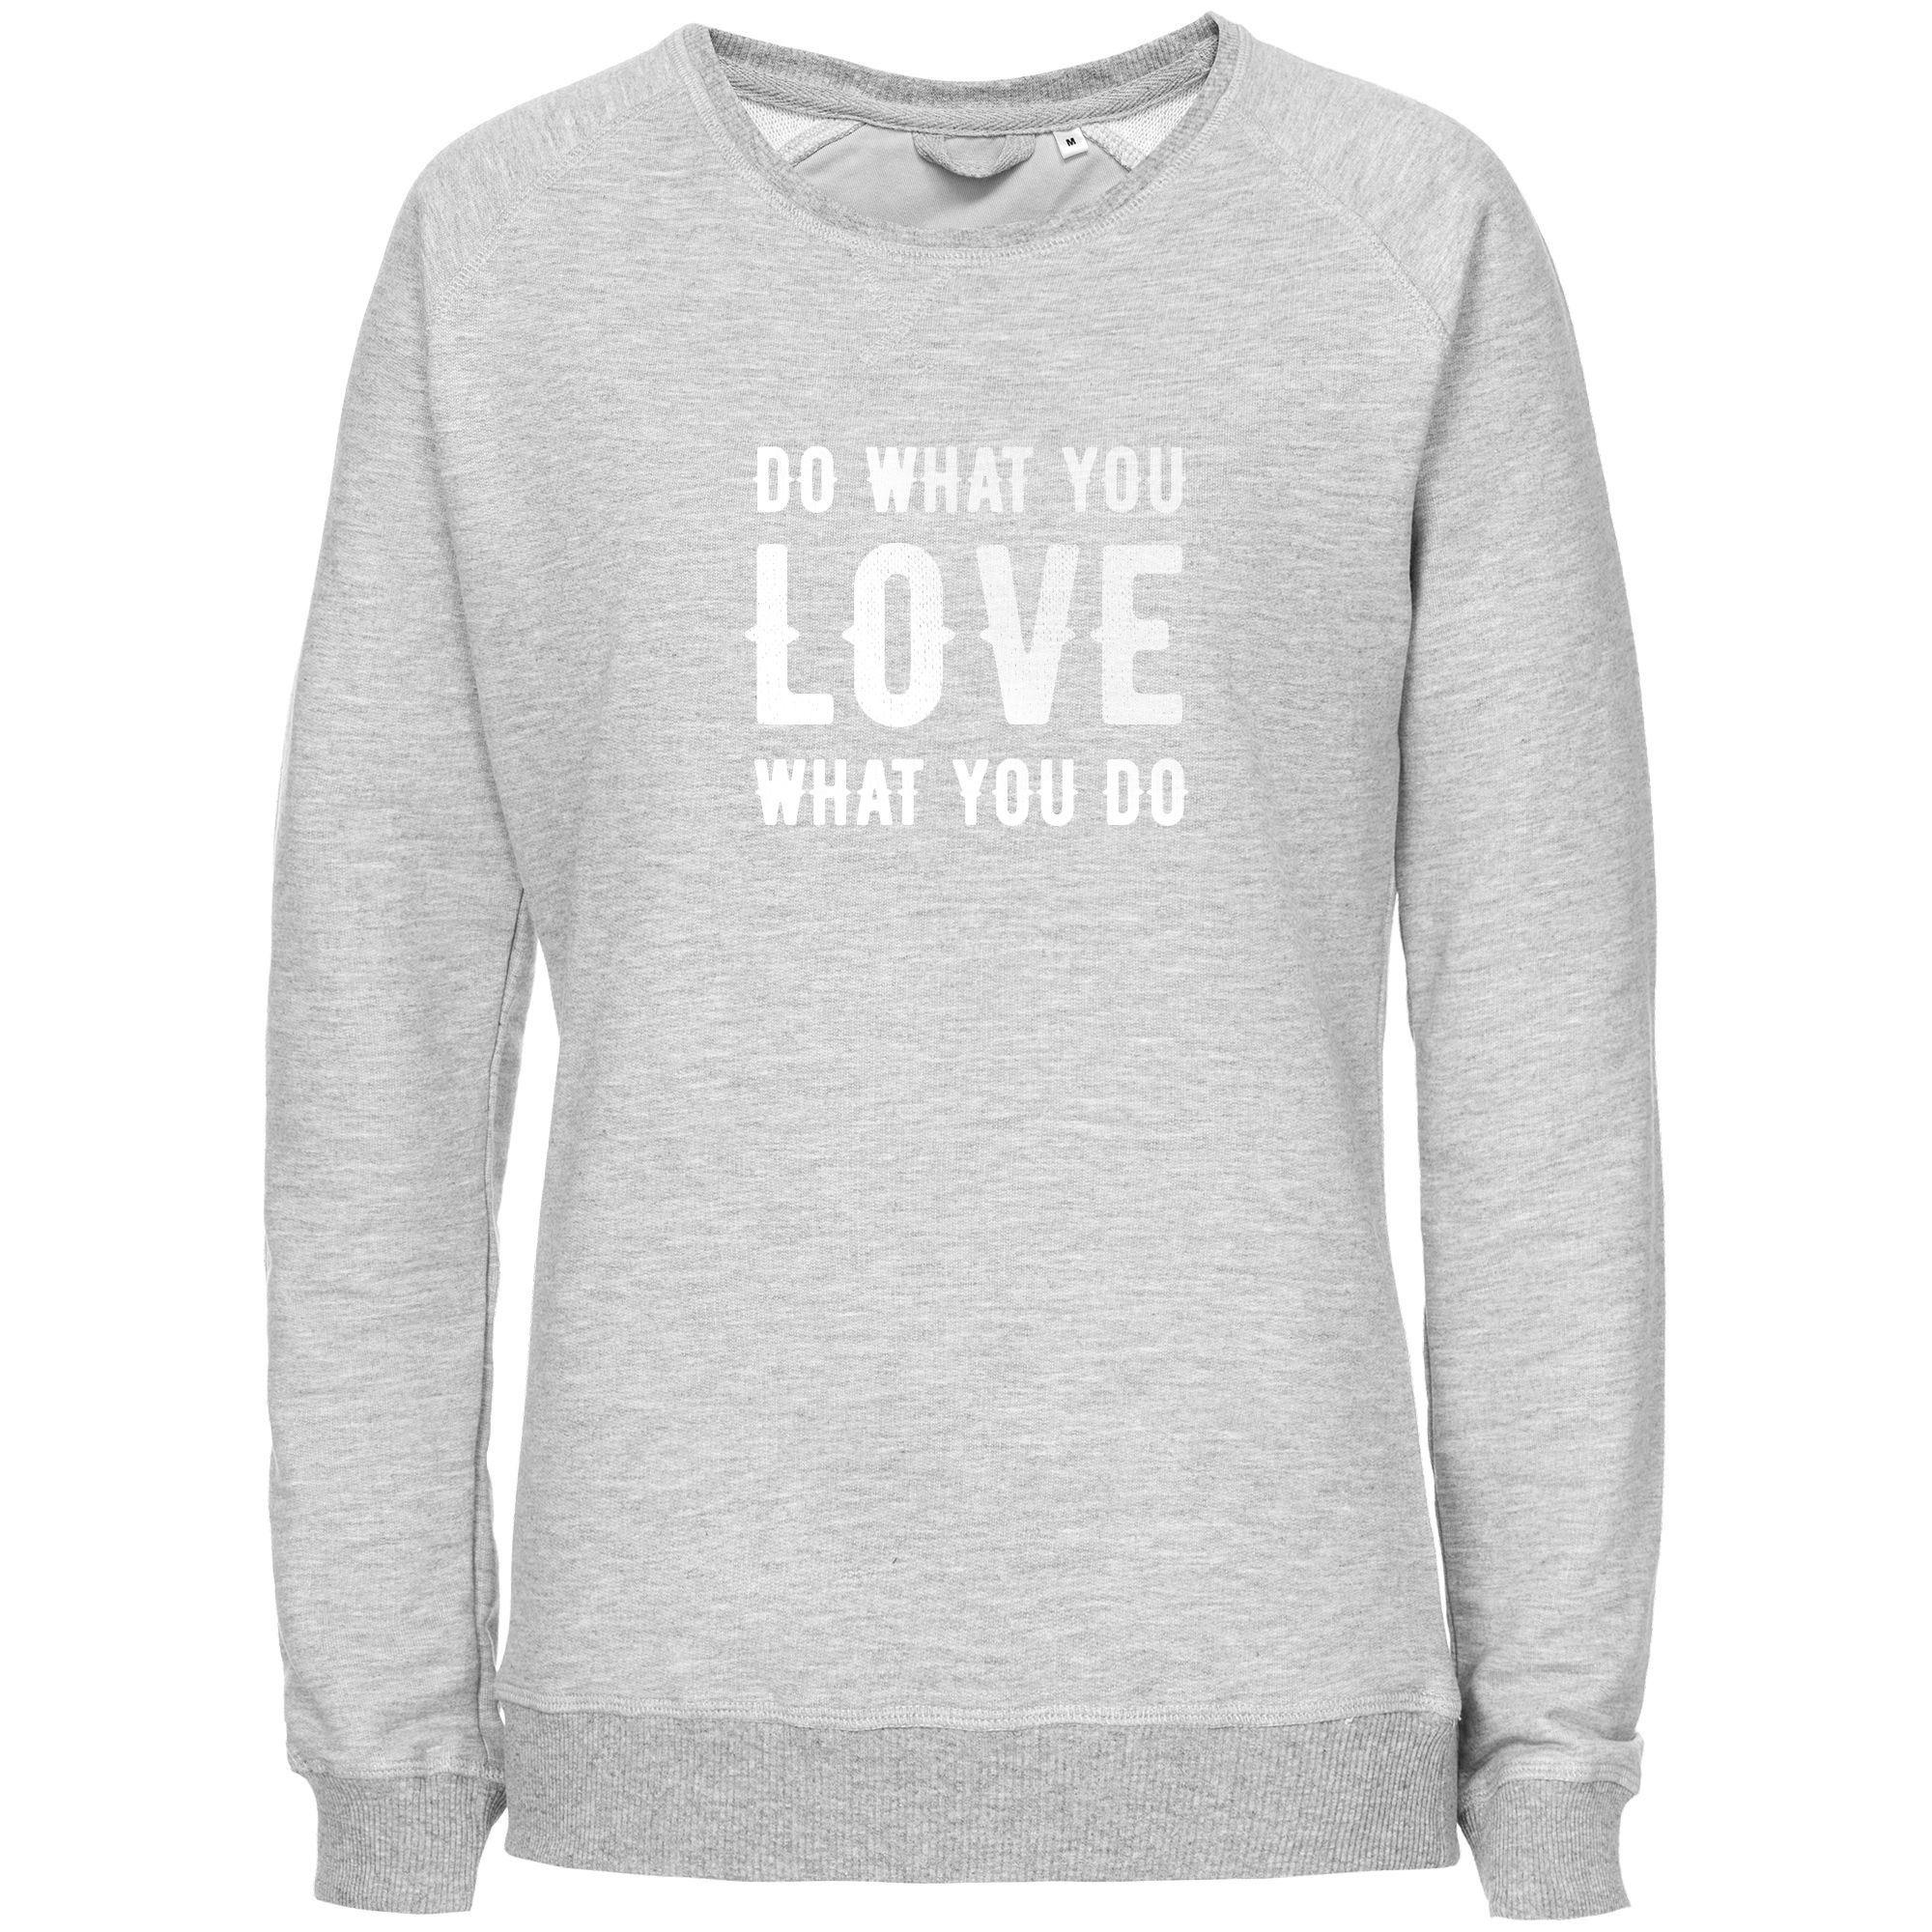 Свитшот женский Do Love, серый меланж арт 70533.11